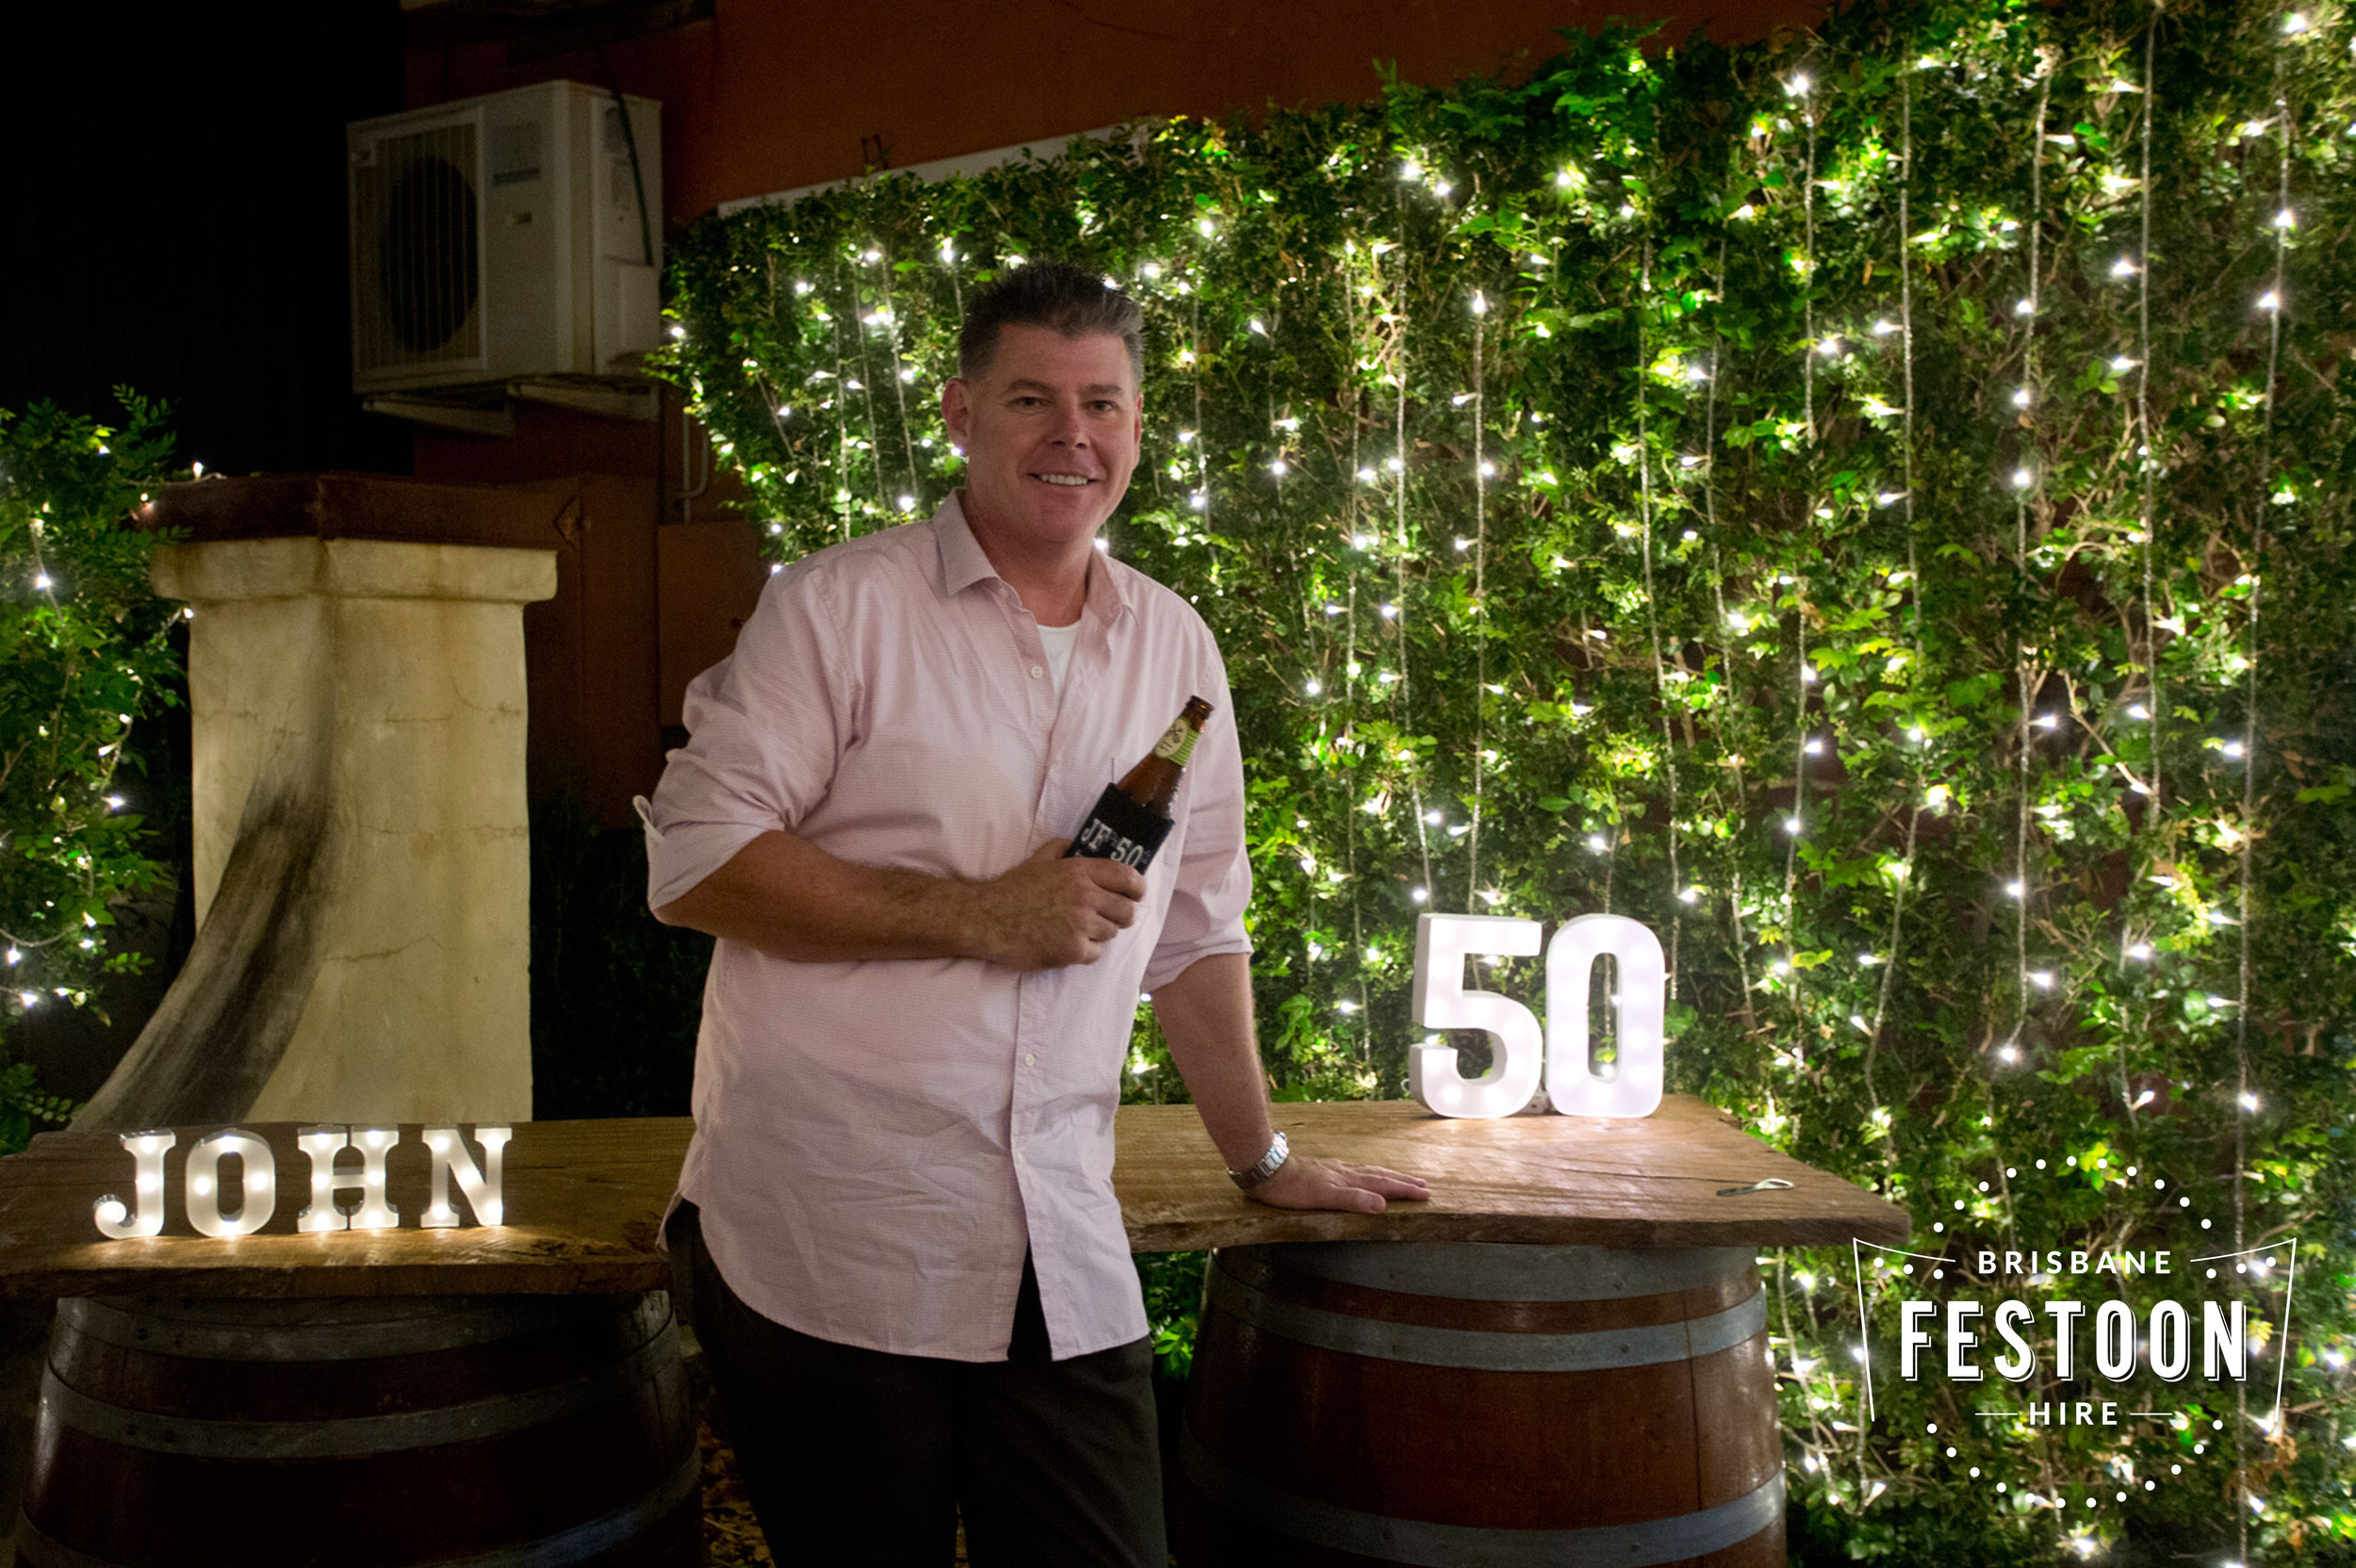 Brisbane Festoon Hire - Fairy Light 50th 2.jpg